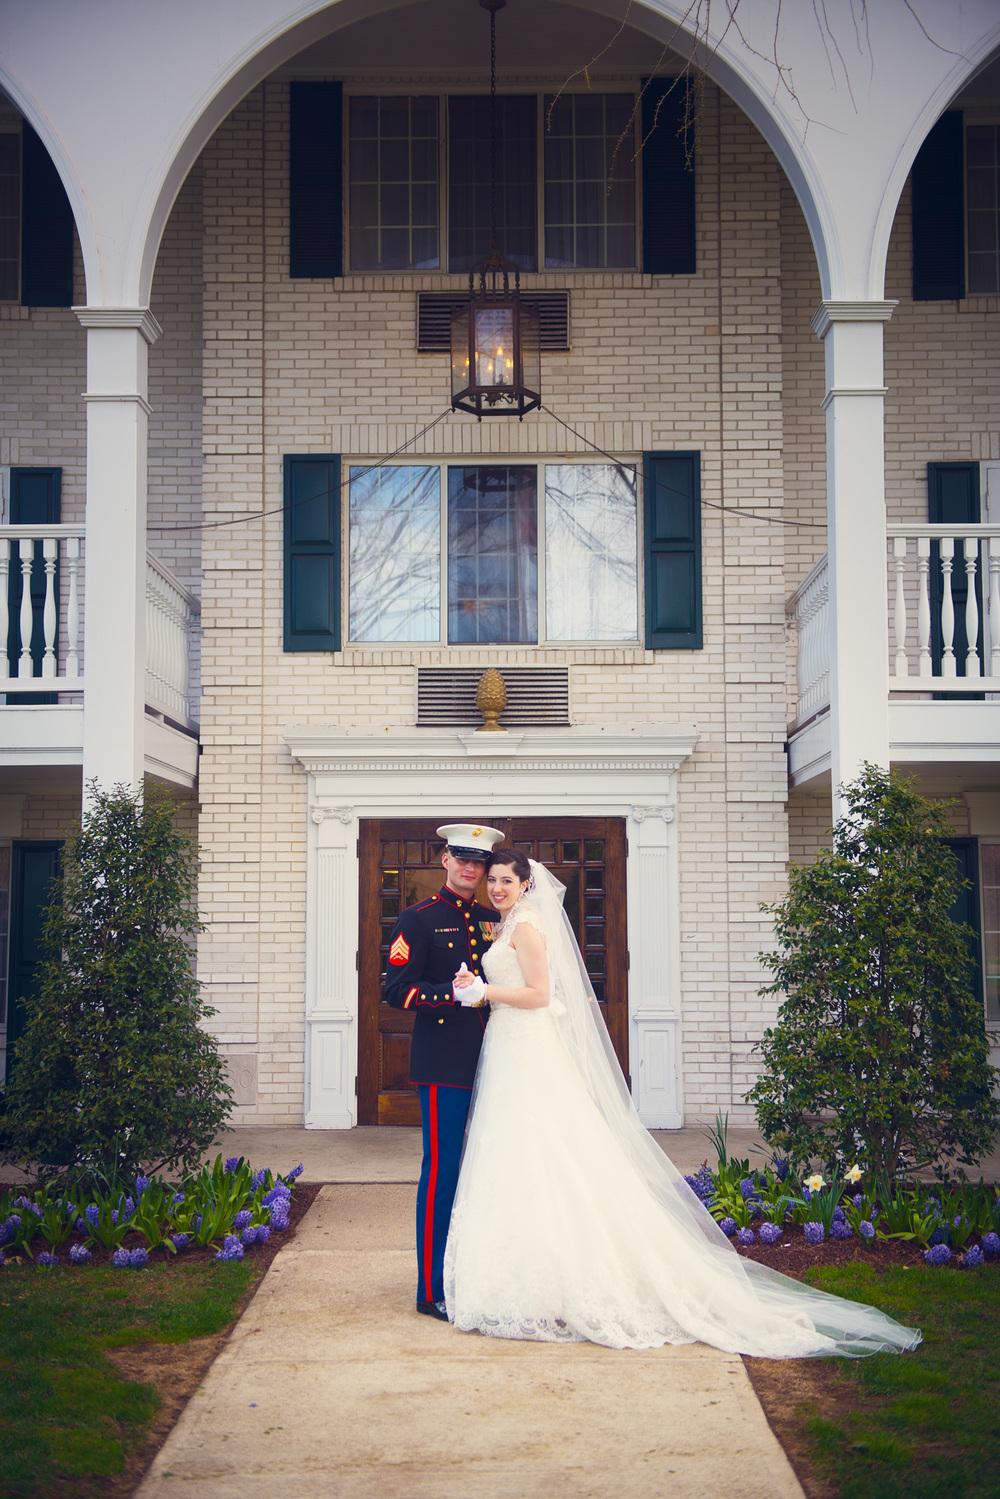 bride groom marine outdoor smiling husband wife portrait THPHOTO